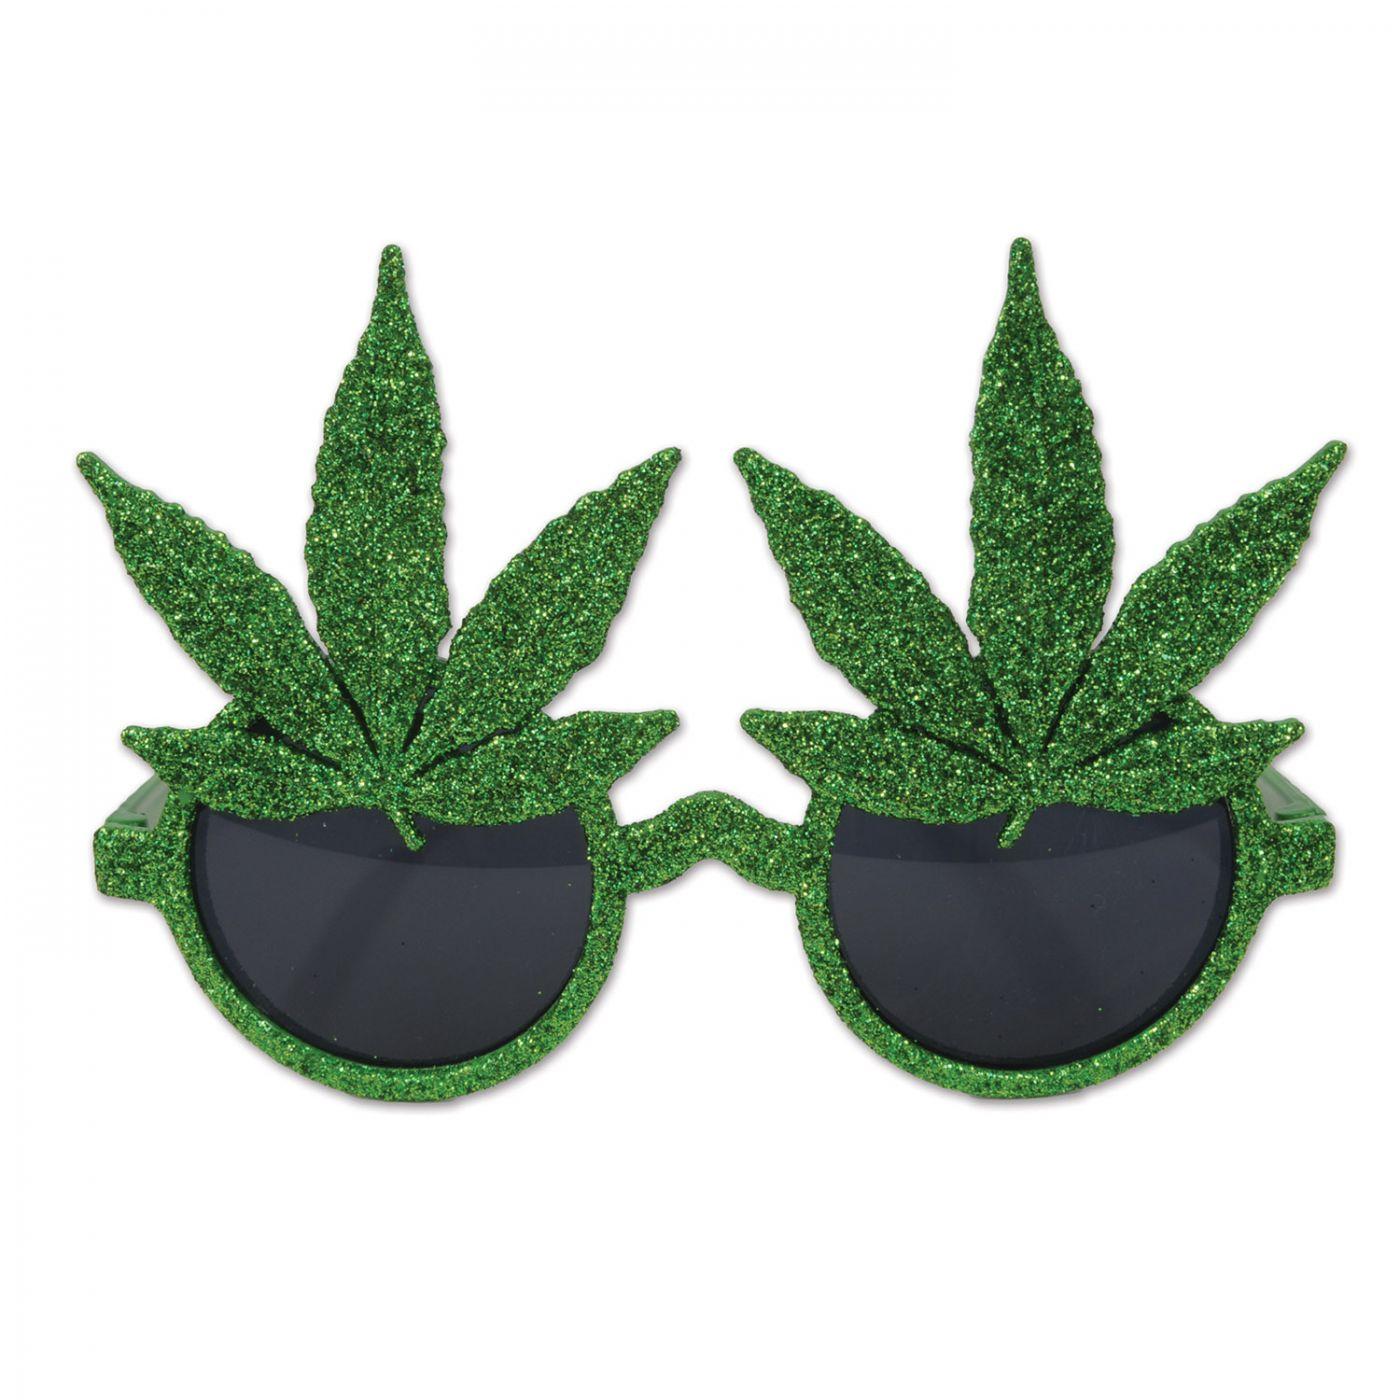 Glittered Weed Glasses (6) image